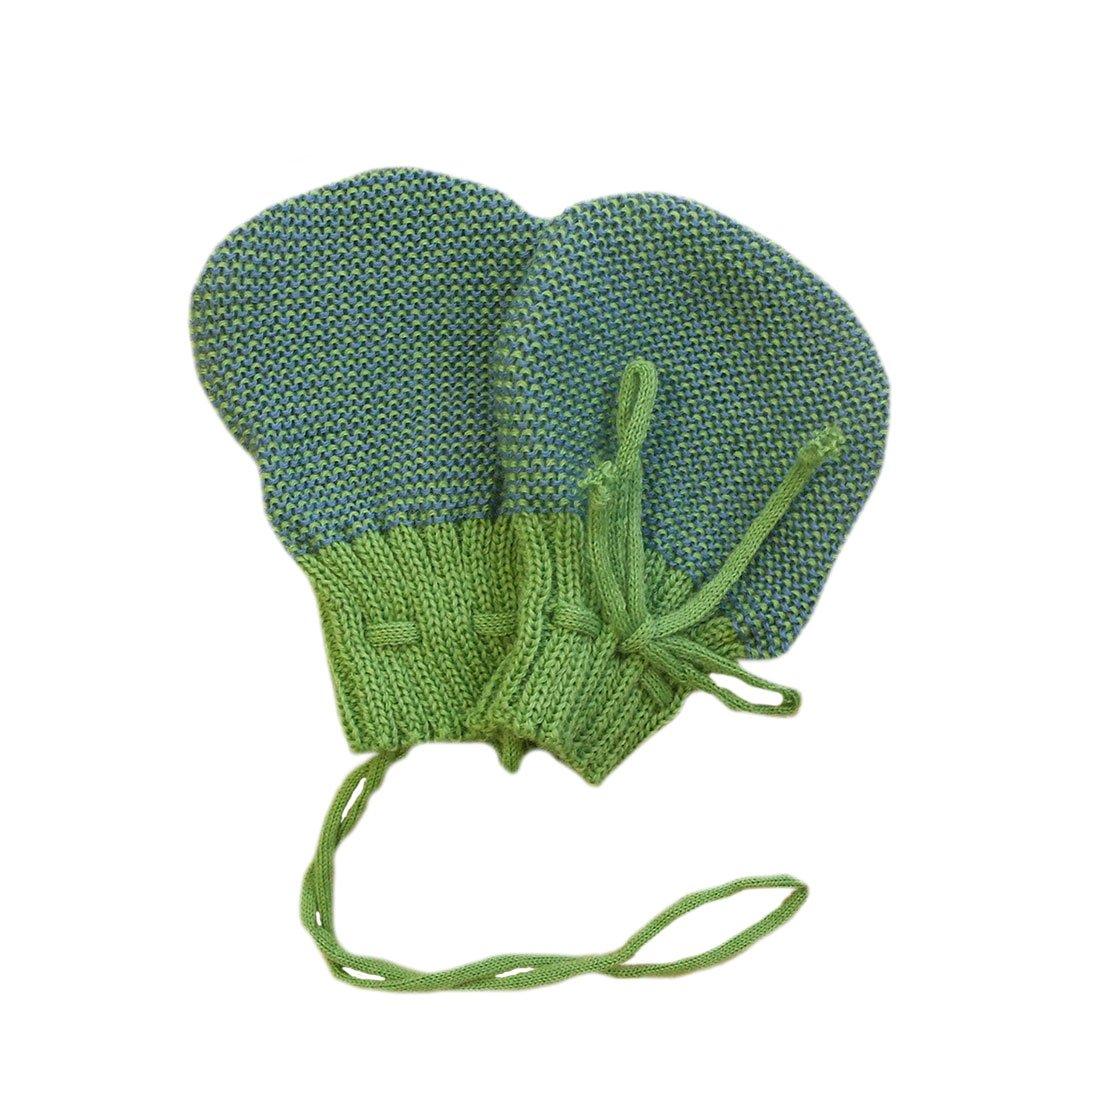 disana Baby Strick-Handschuhe Bio-Merinoschurwolle Anthrazit-Grau Gr